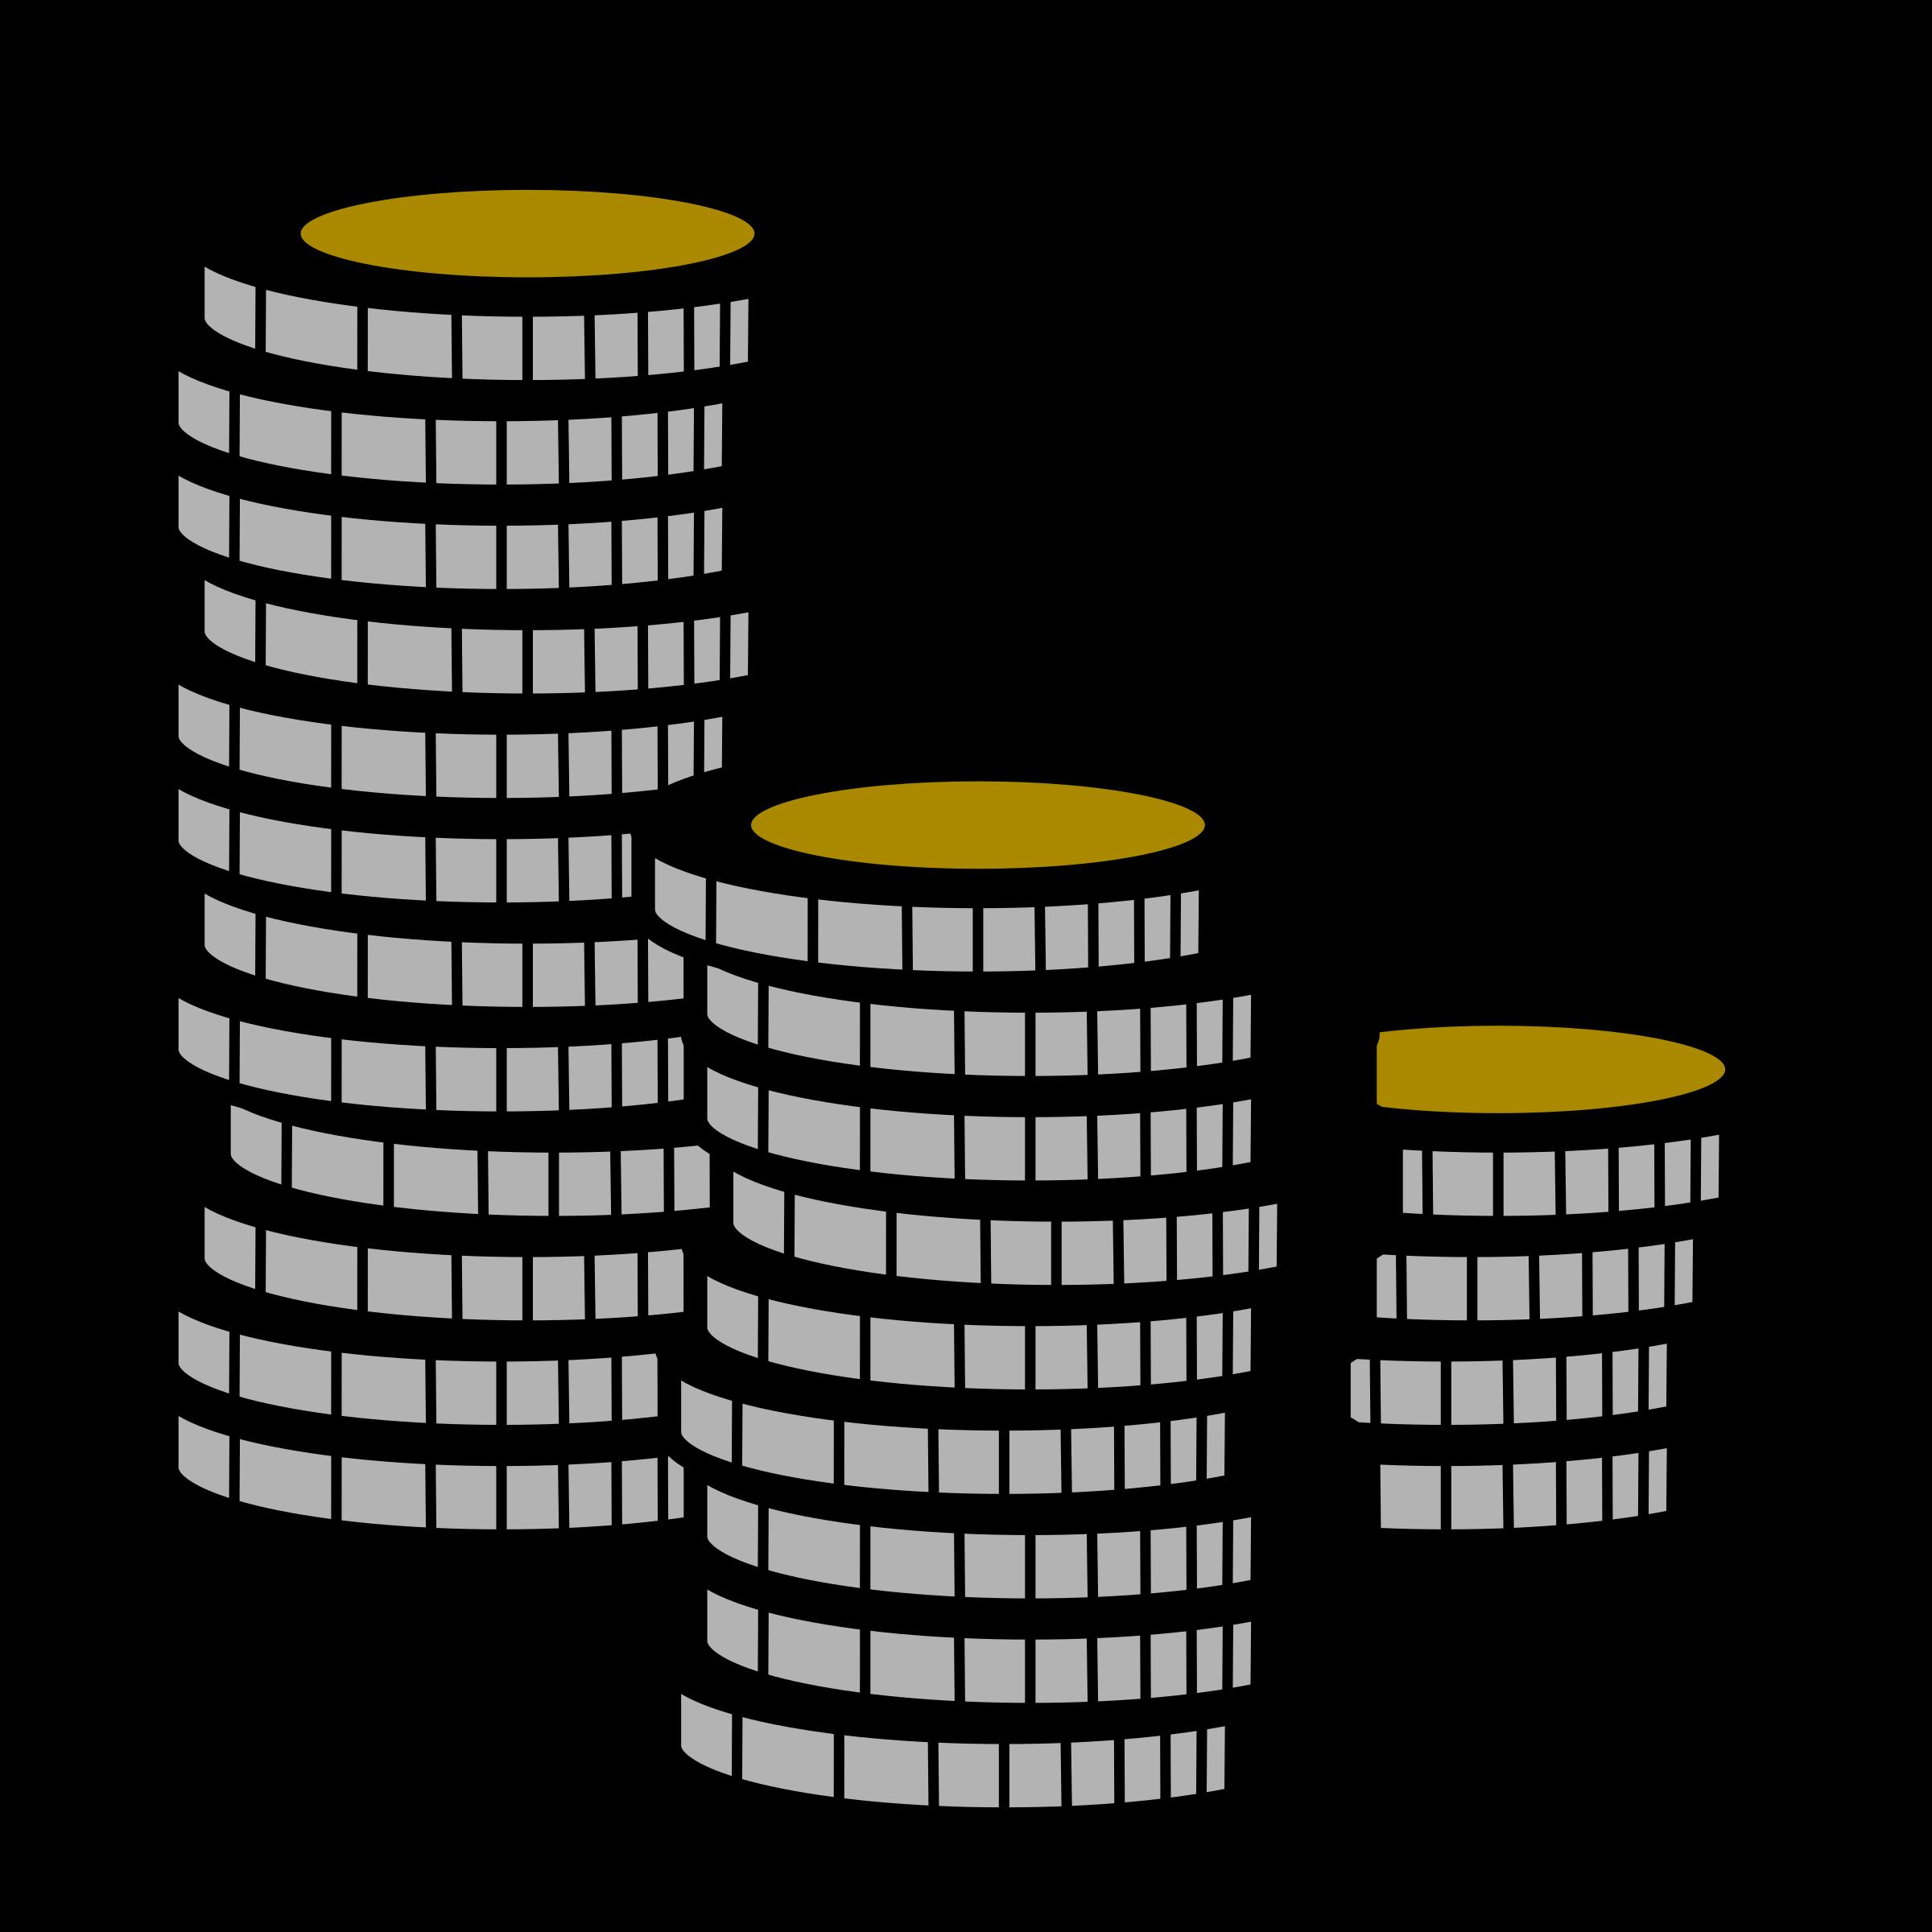 Big image png. Coins clipart line